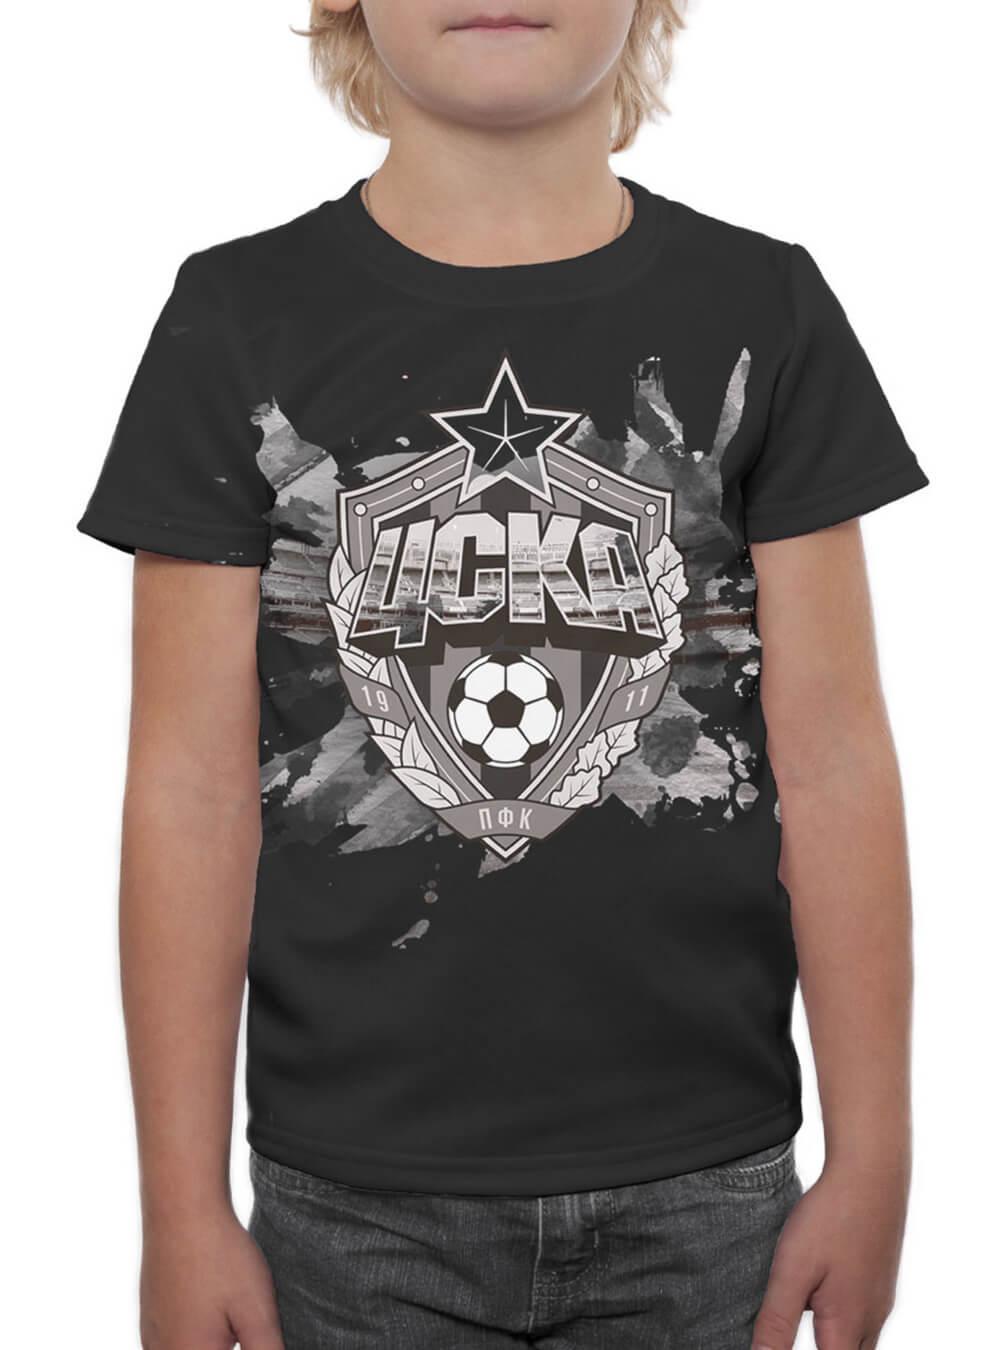 Футболка детская Эмблема черная (122)Одежда на заказ<br>Футболка детская Эмблема черная<br>